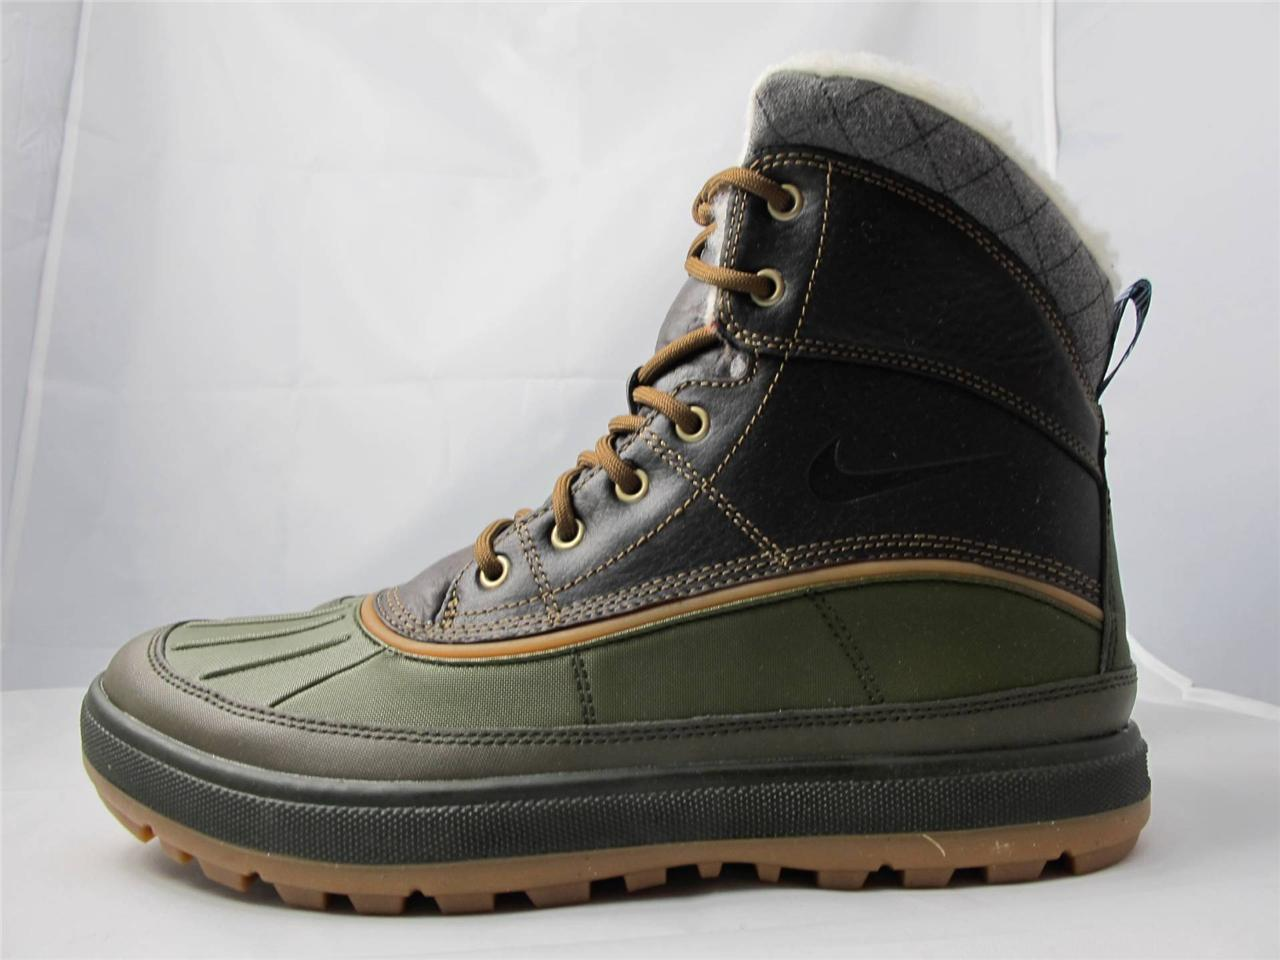 acg nike boots woodside 2 boot